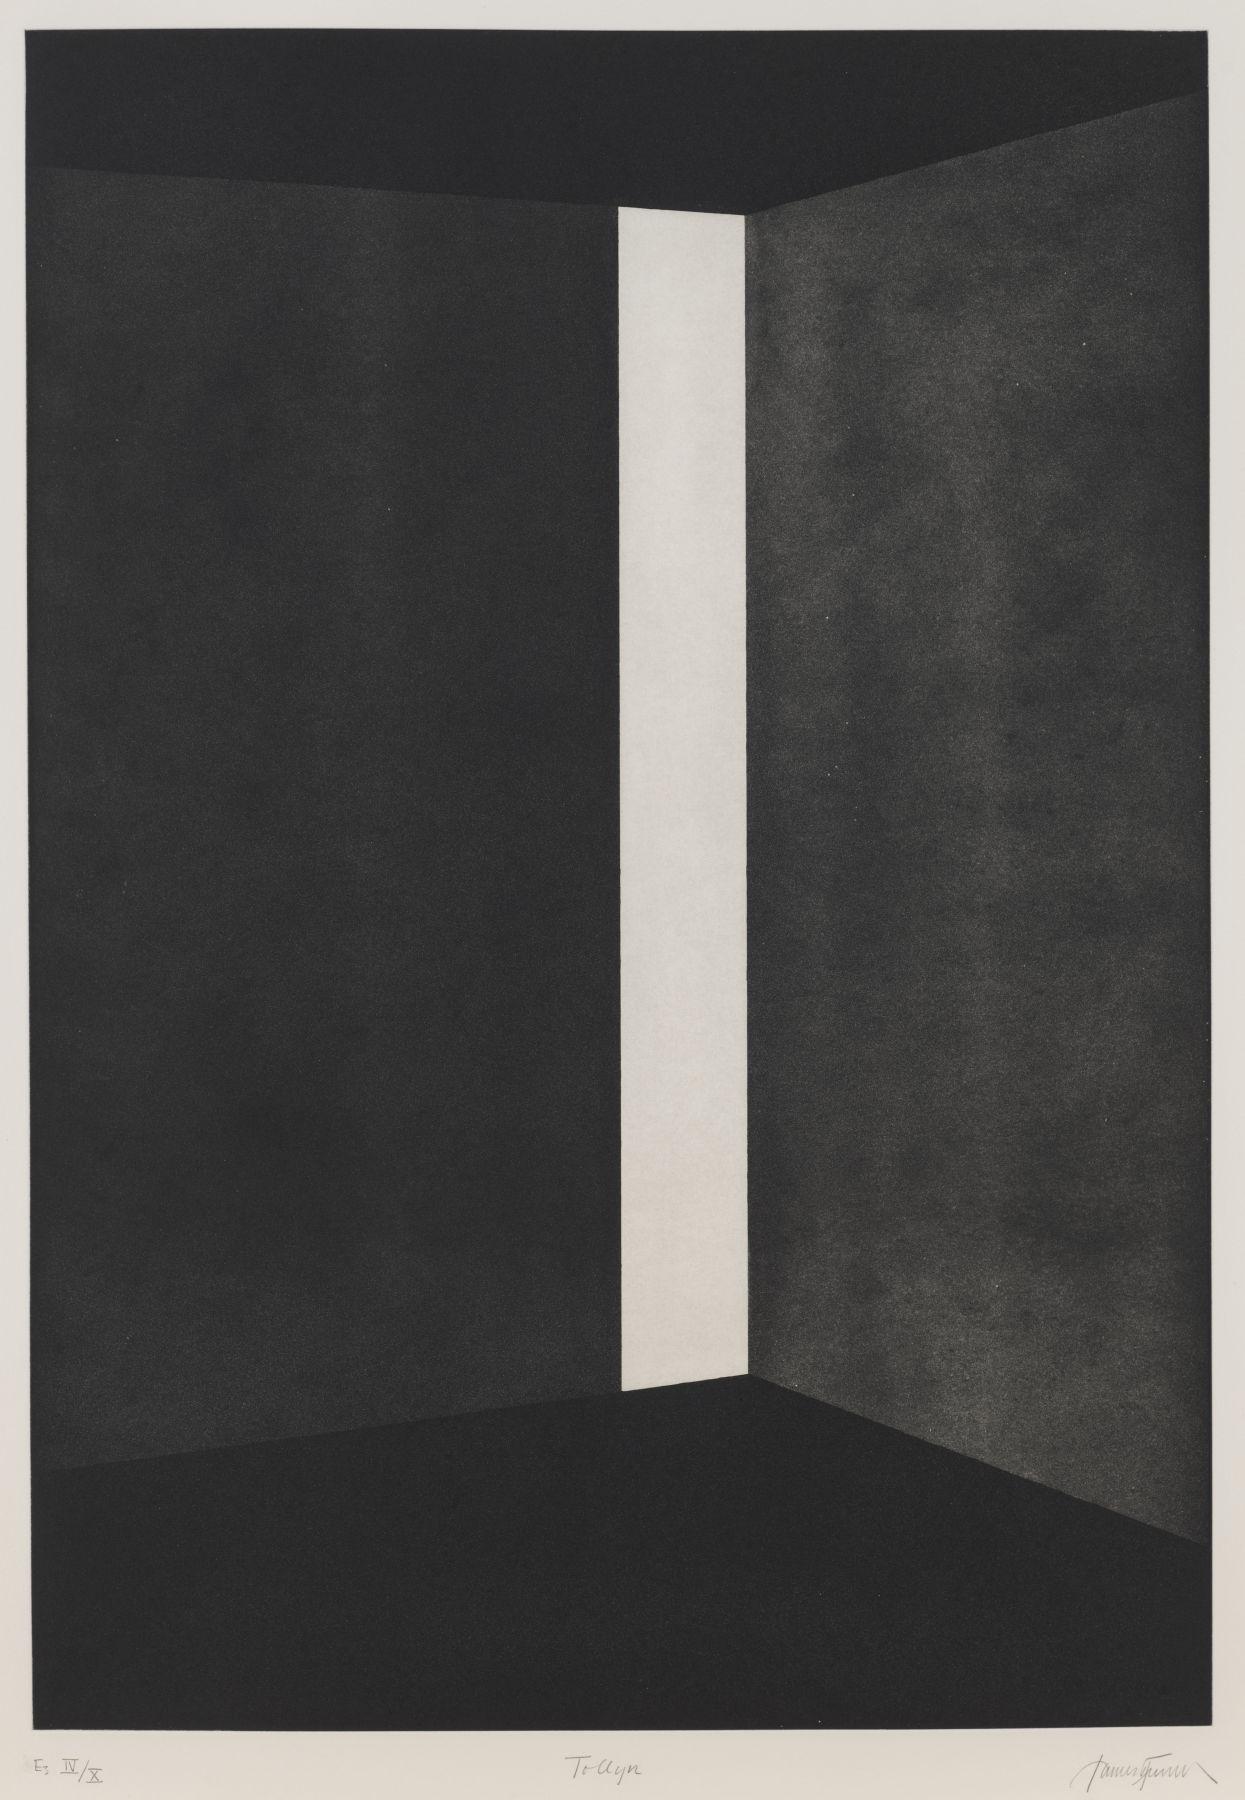 First Light (Columns) Tollyn - James Turrell